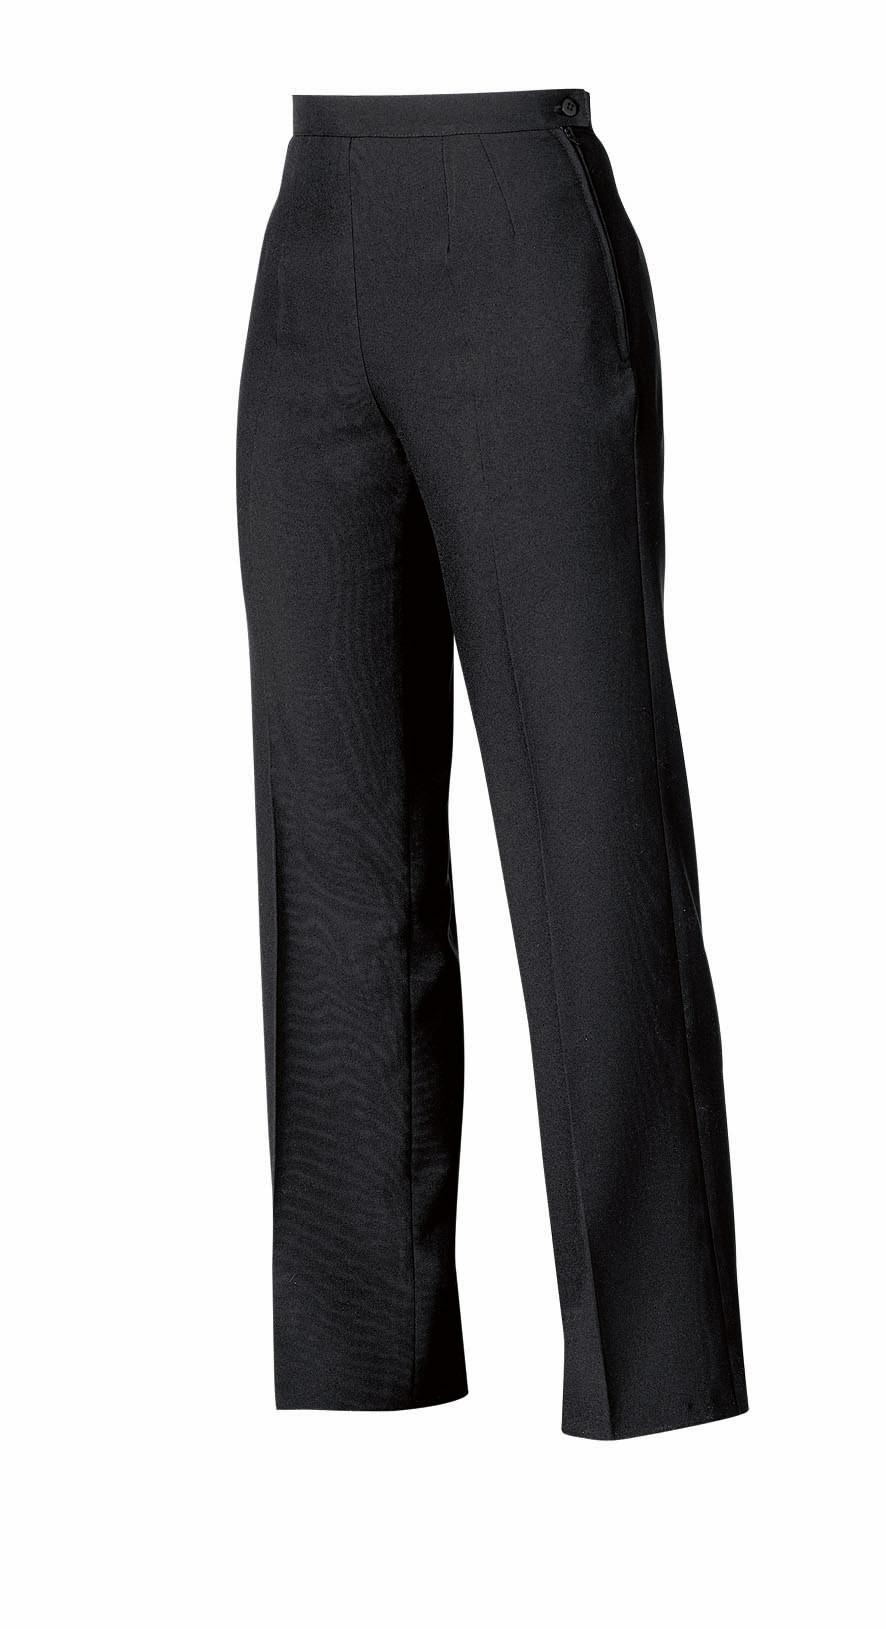 Pantalone donna nero